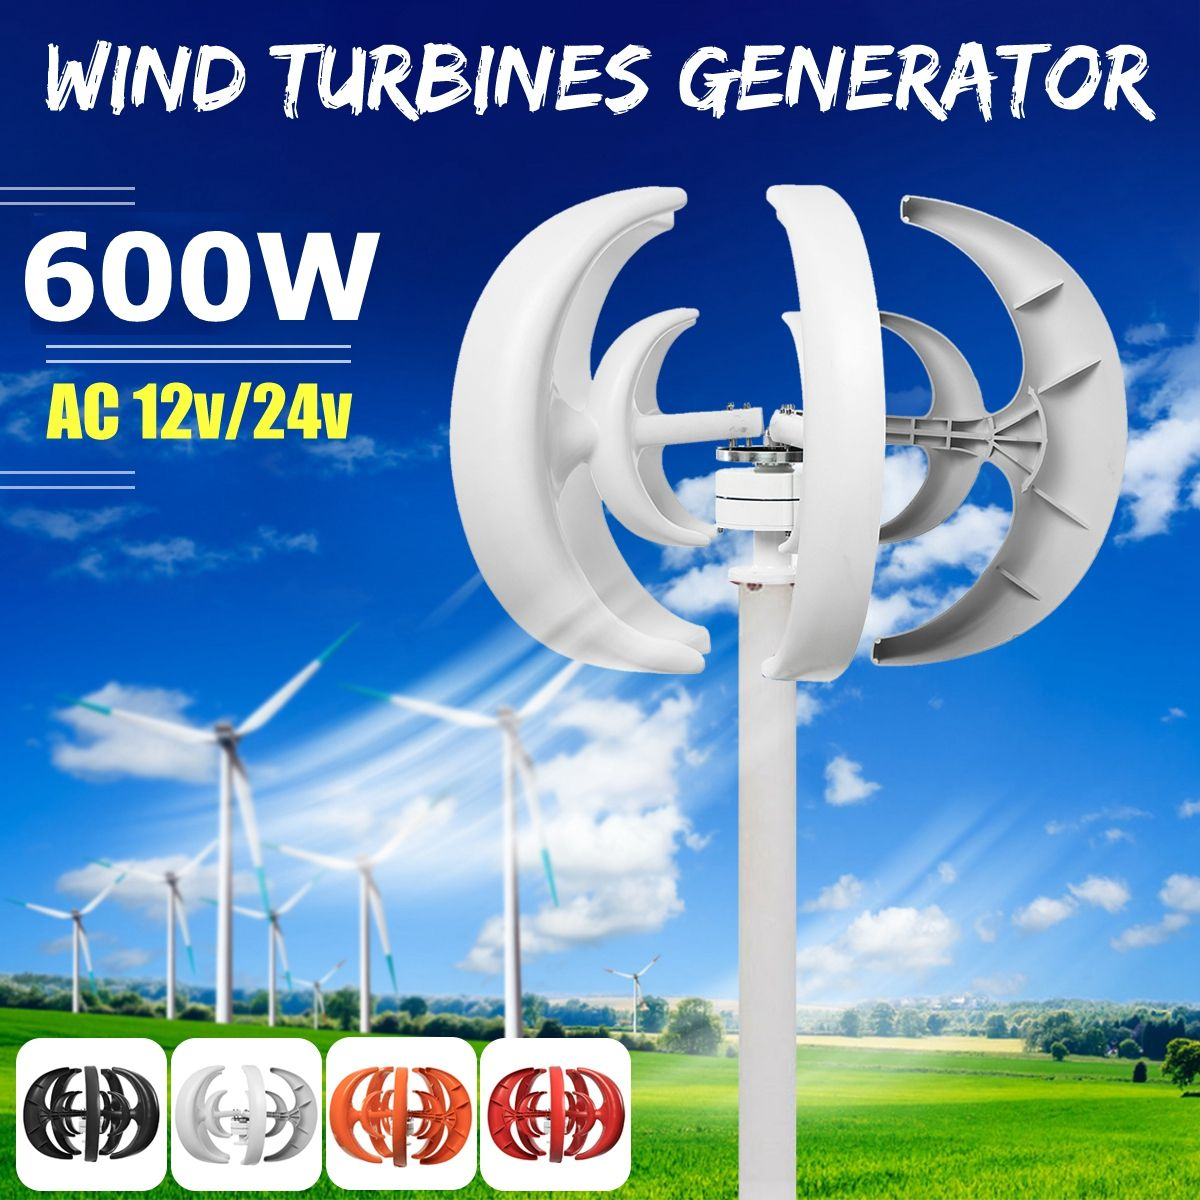 Max 600 watt AC 12 v 24 v Wind Turbine Generator Laterne 5 Klingen Motor Kit Vertikale Achse